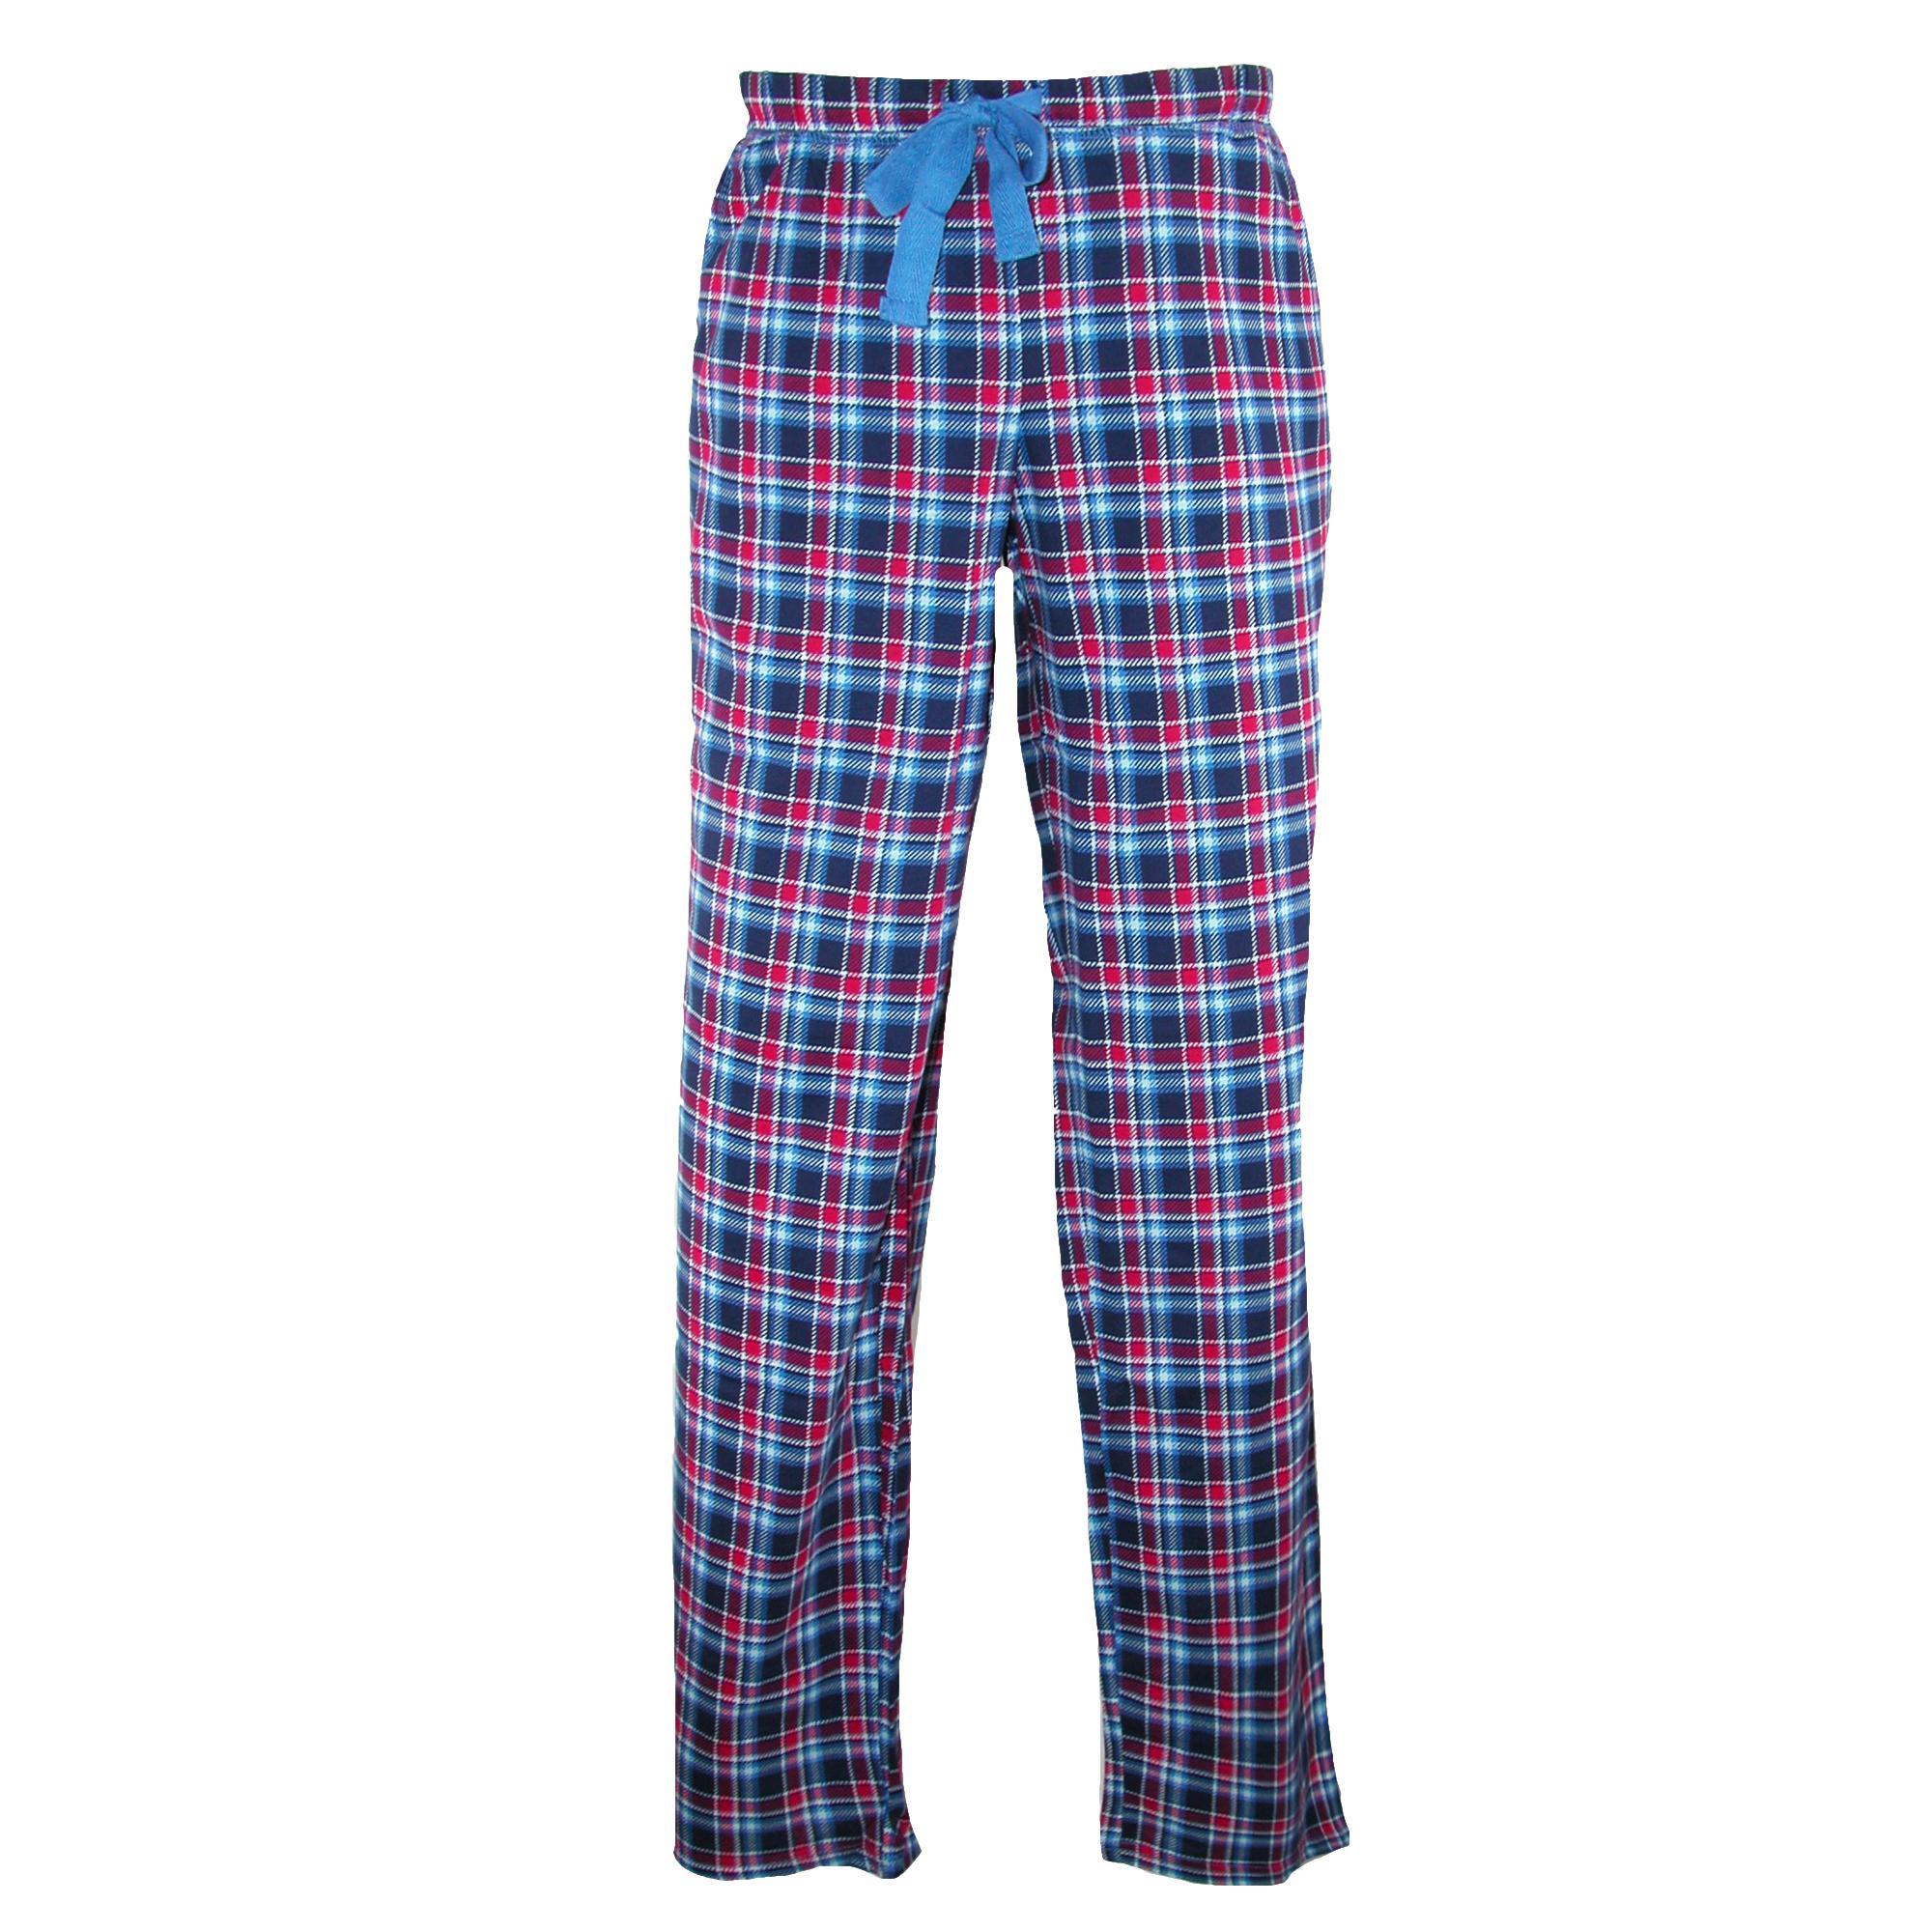 Hanes Womens Knit Print Pajama Lounge Pants